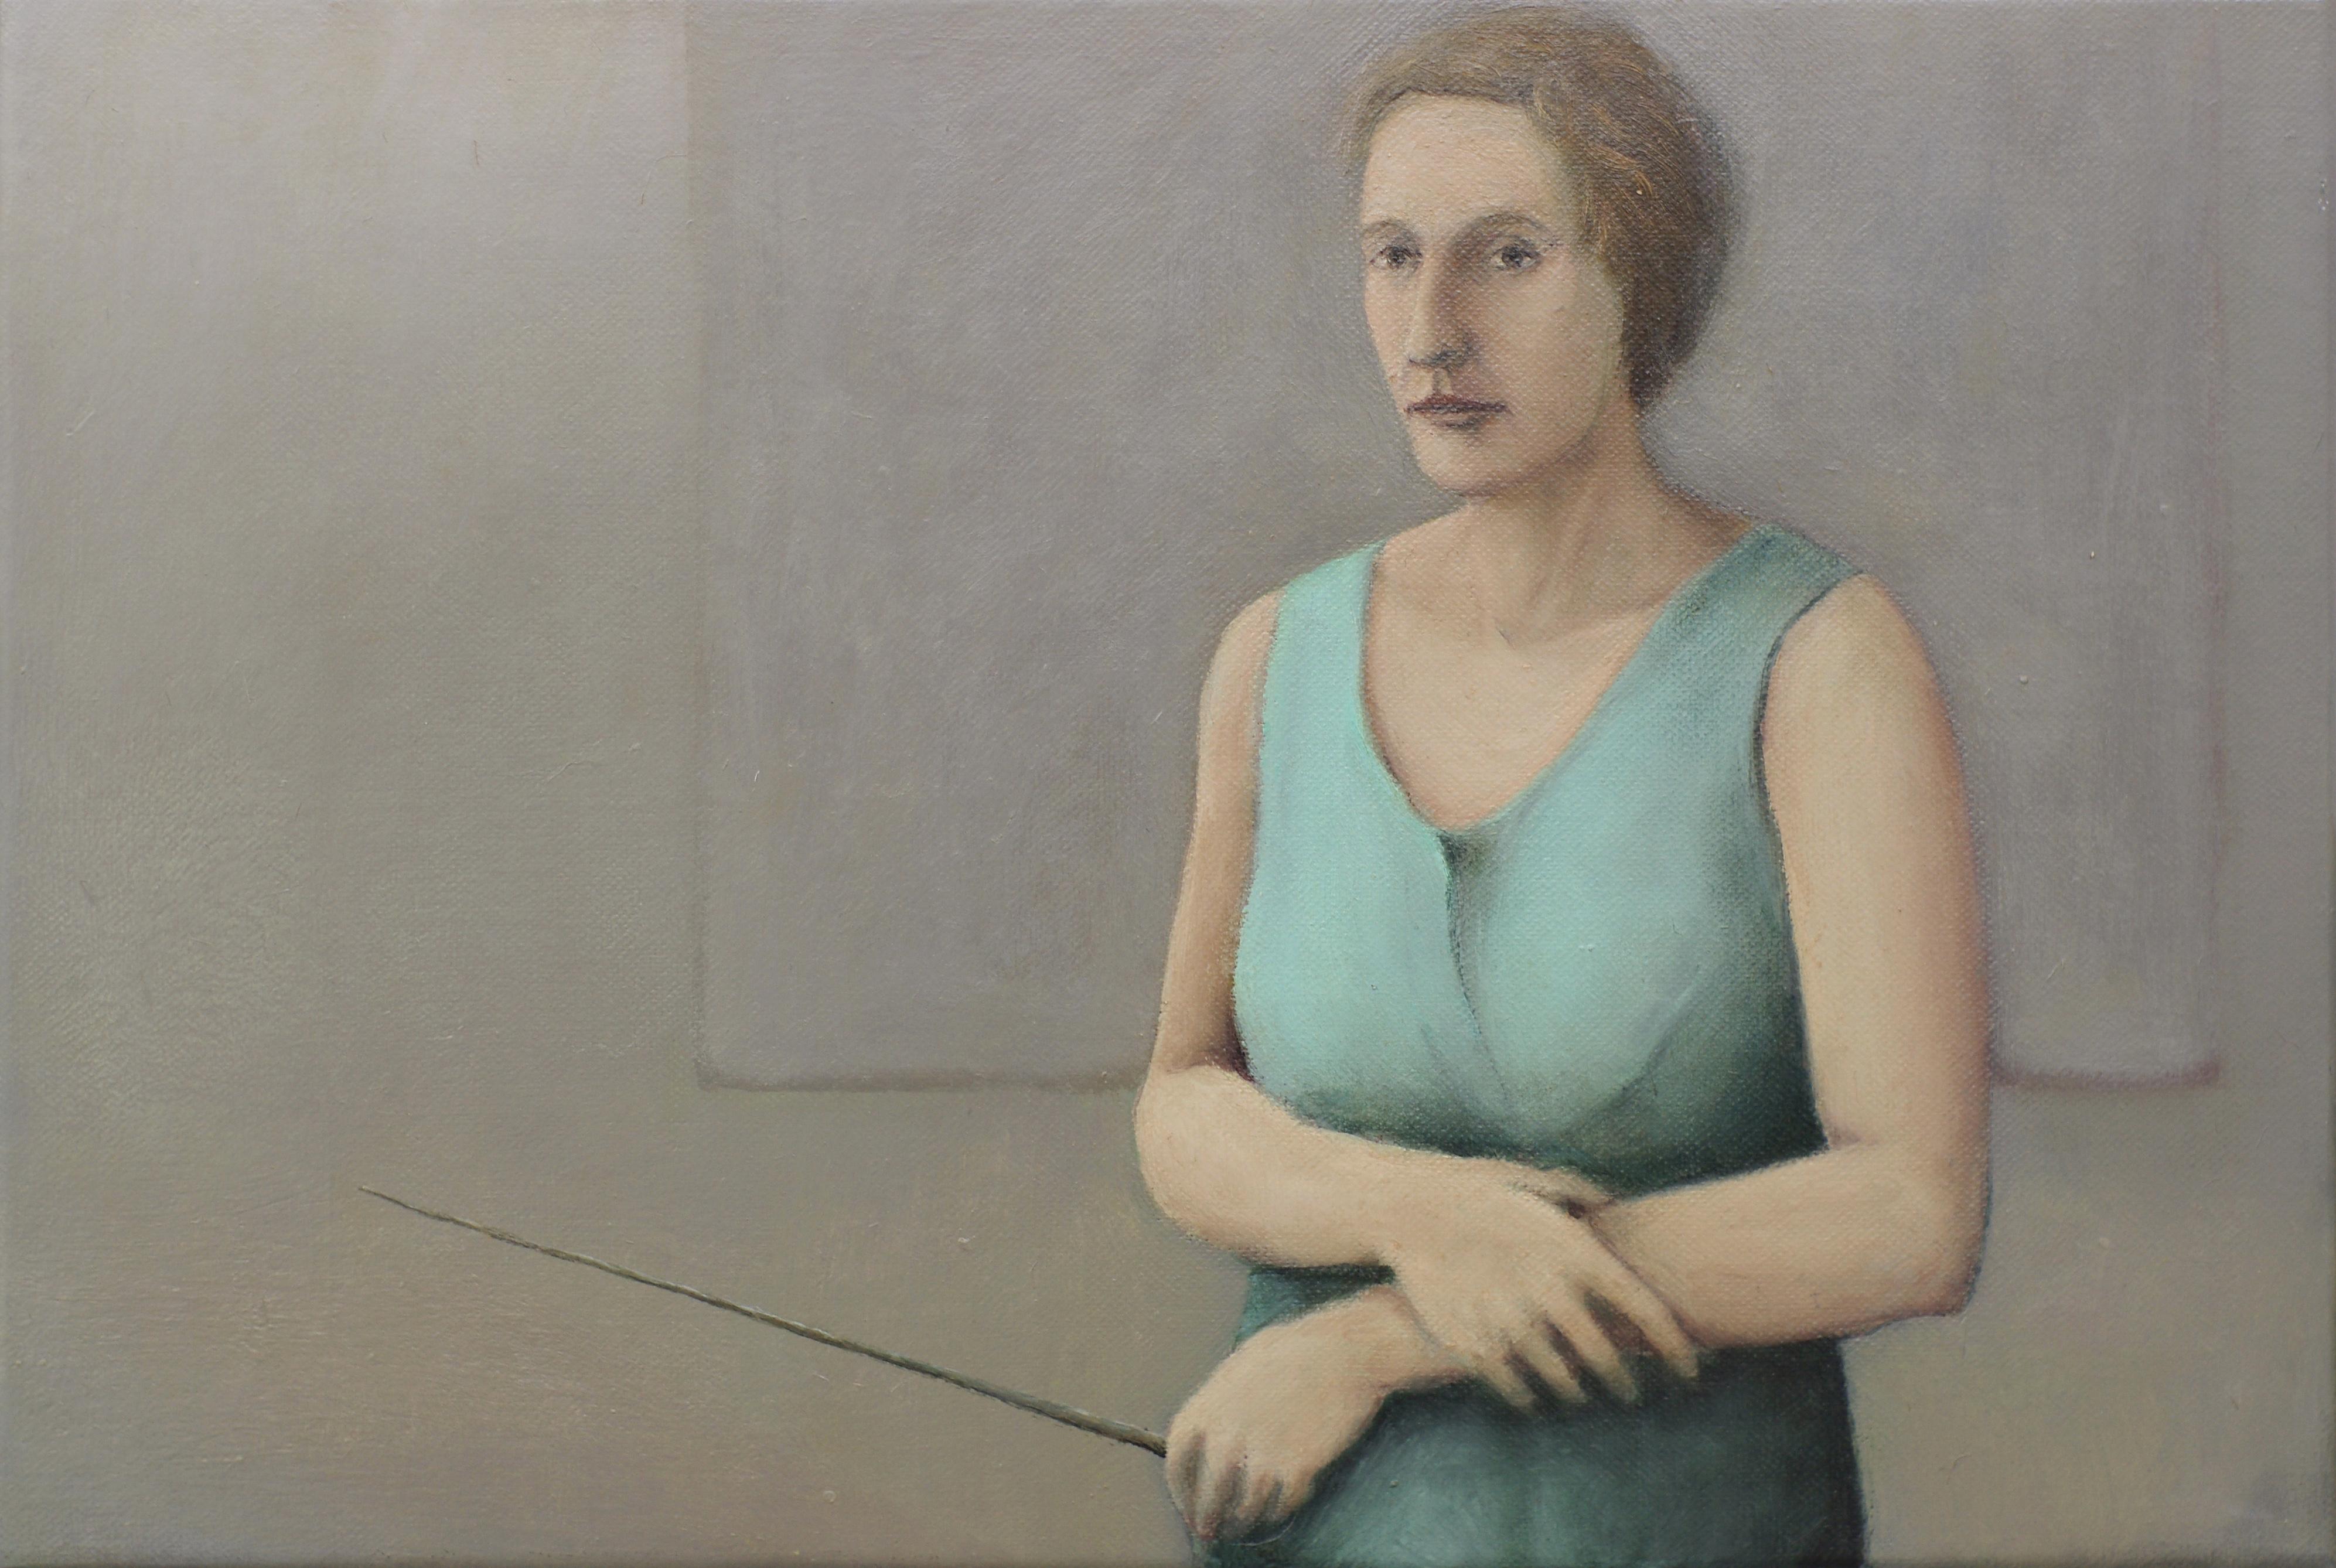 2014, Öl auf Leinwand 27 x 40 cm Kunstkomission Stadt Thun